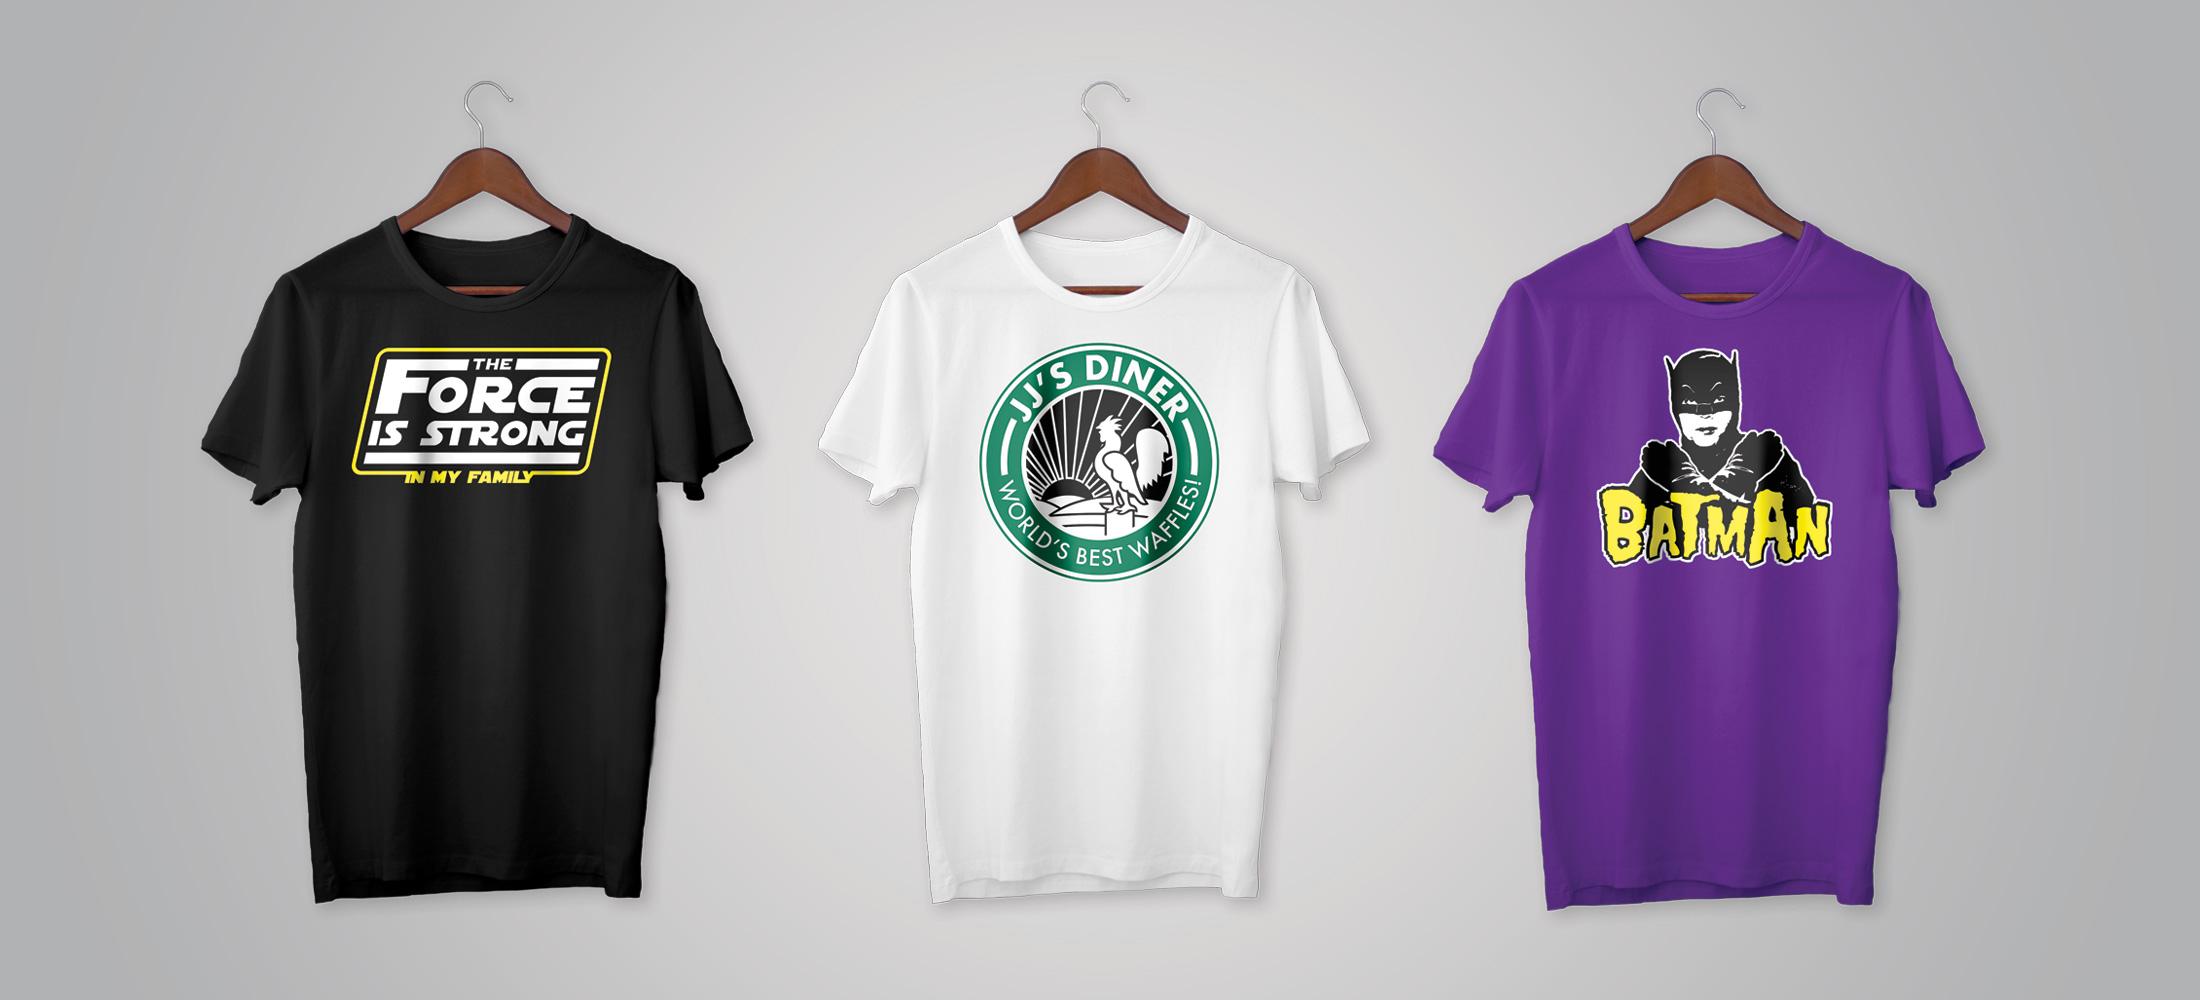 T Shirt Design Software Agbu Hye Geen